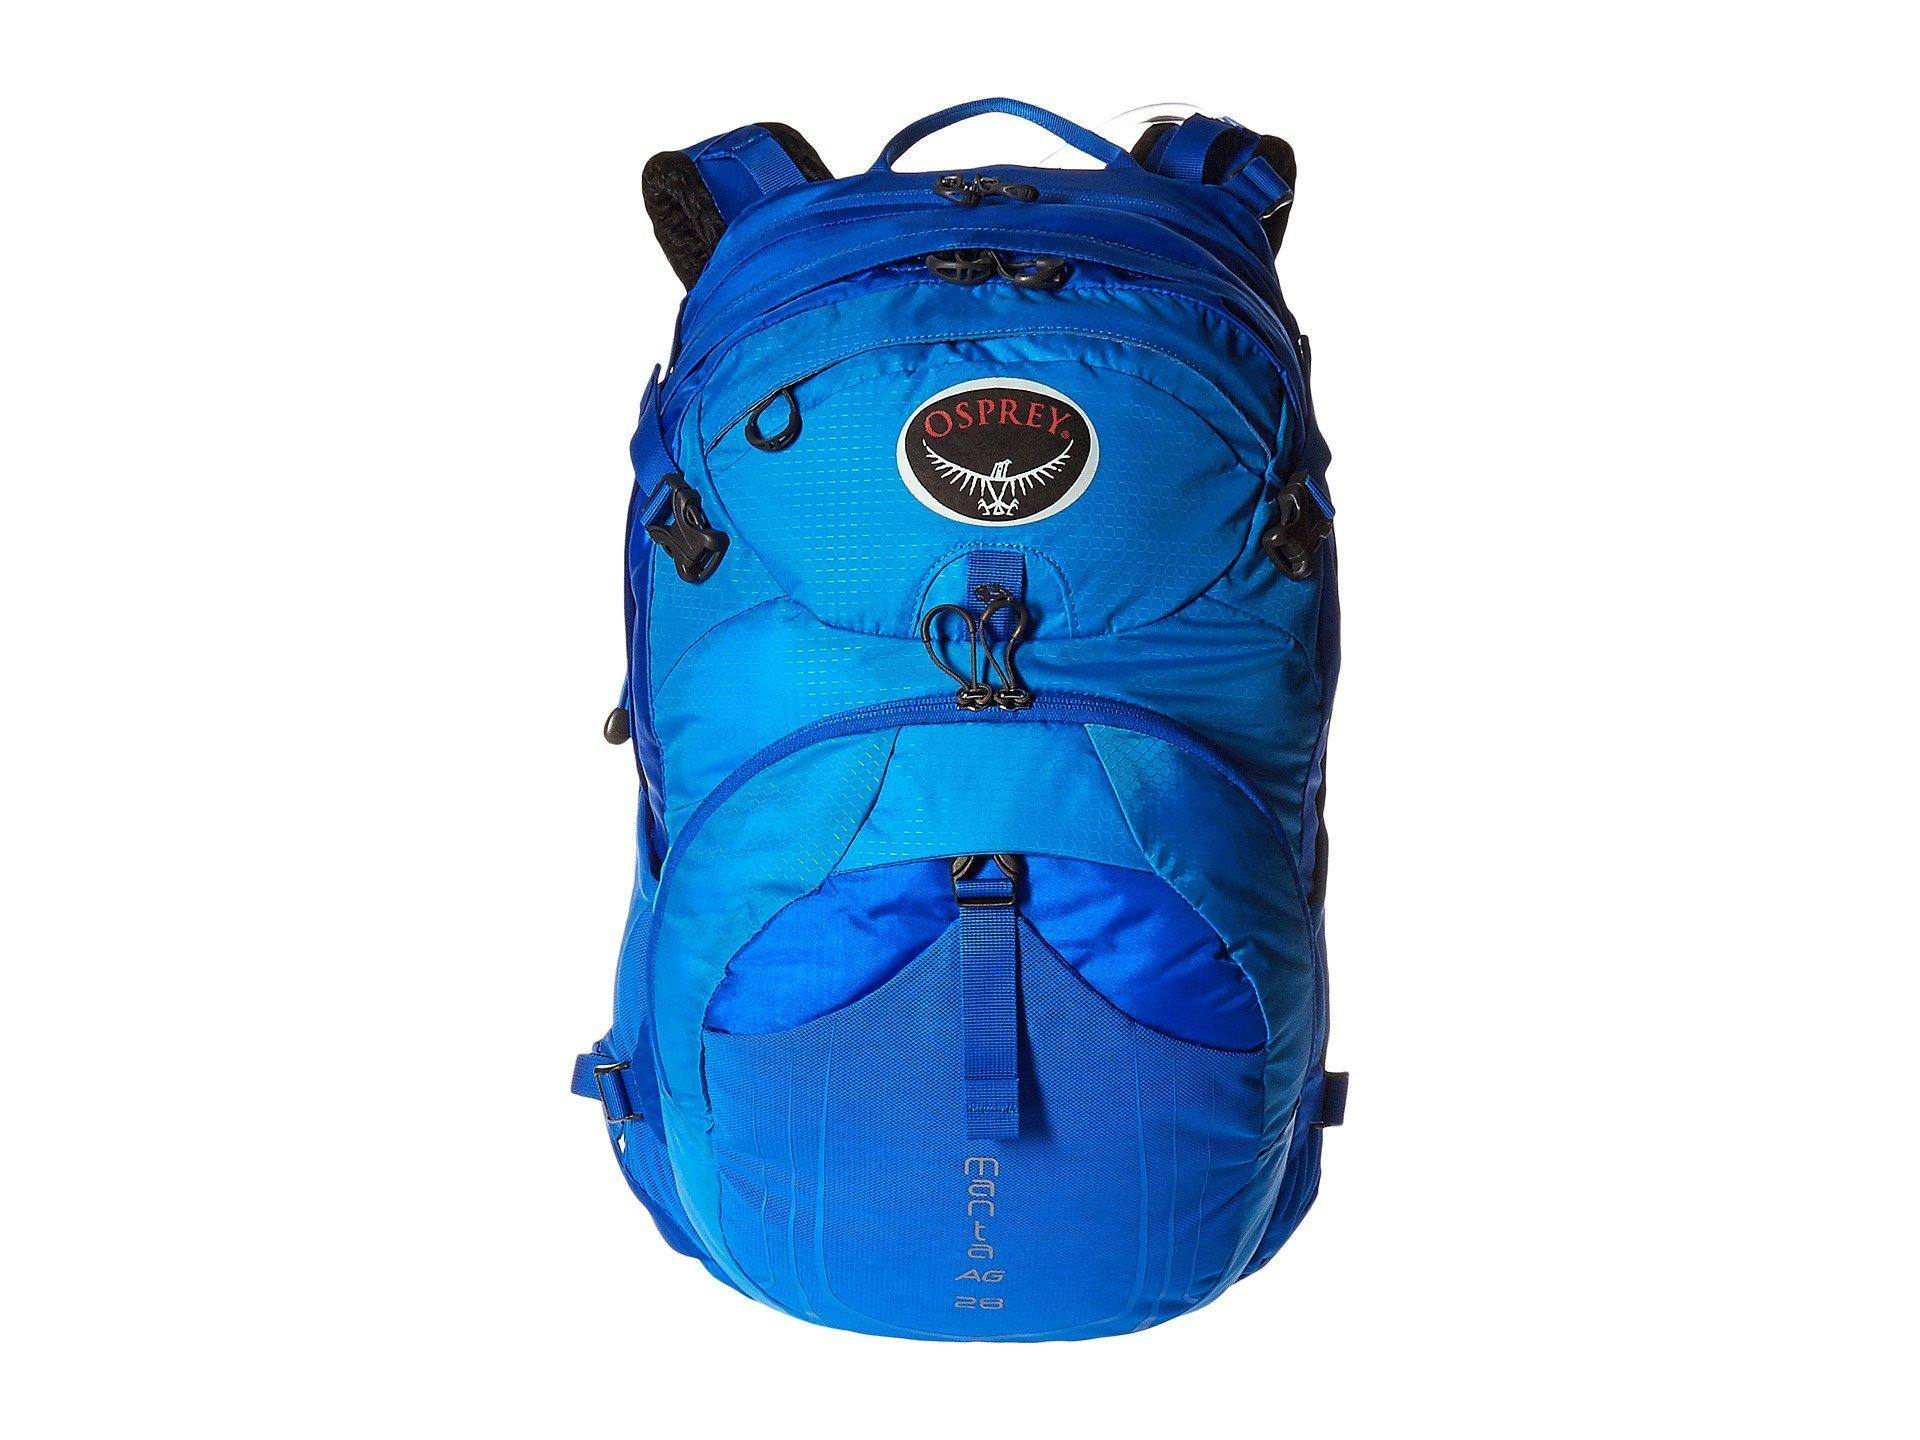 Osprey Packs Manta AG 28 Hydration Pack, Sonic Blue, Medium/Large